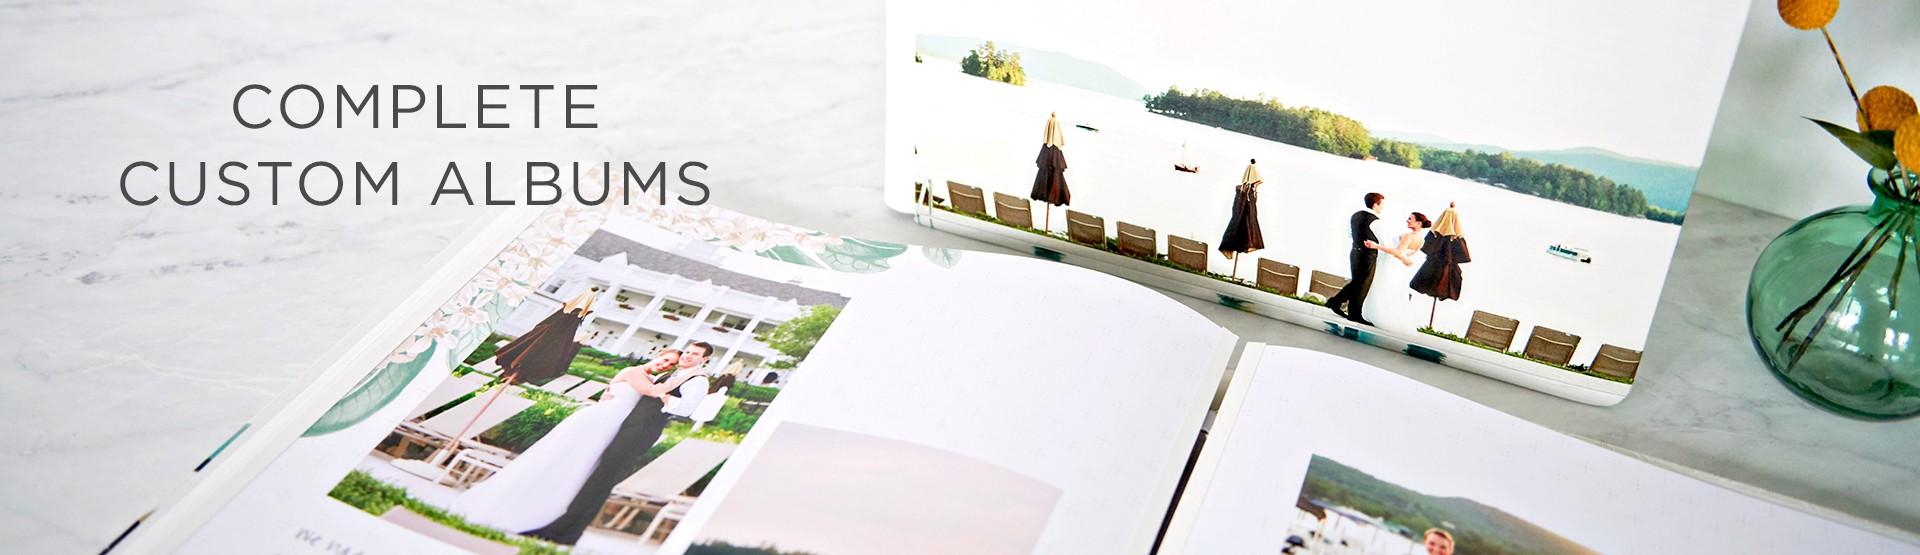 Custom Photo Albums